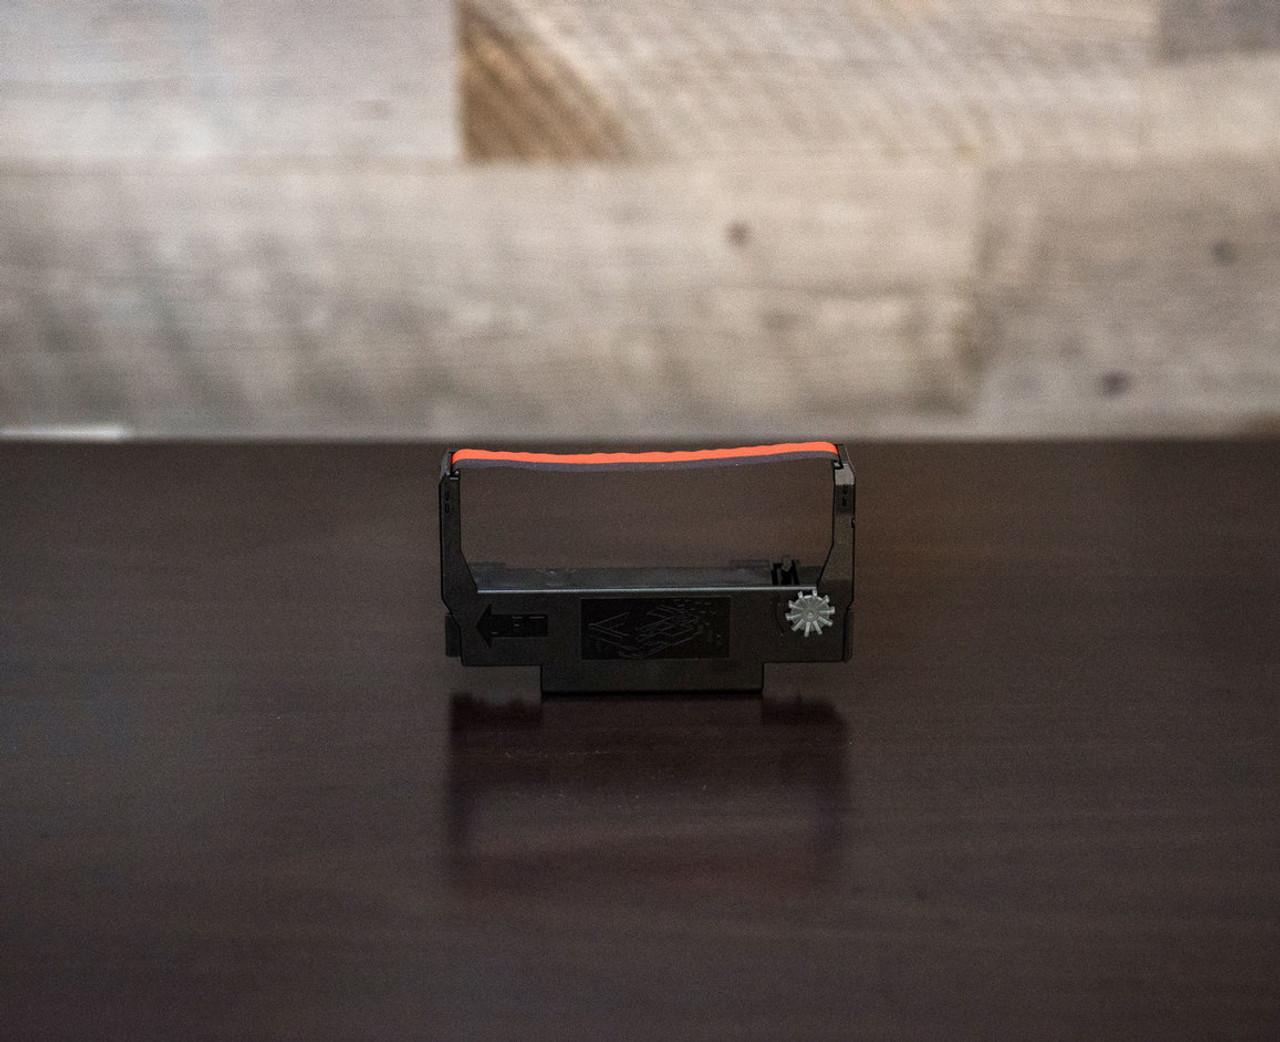 Ink Ribbon for Epson Kitchen Printer